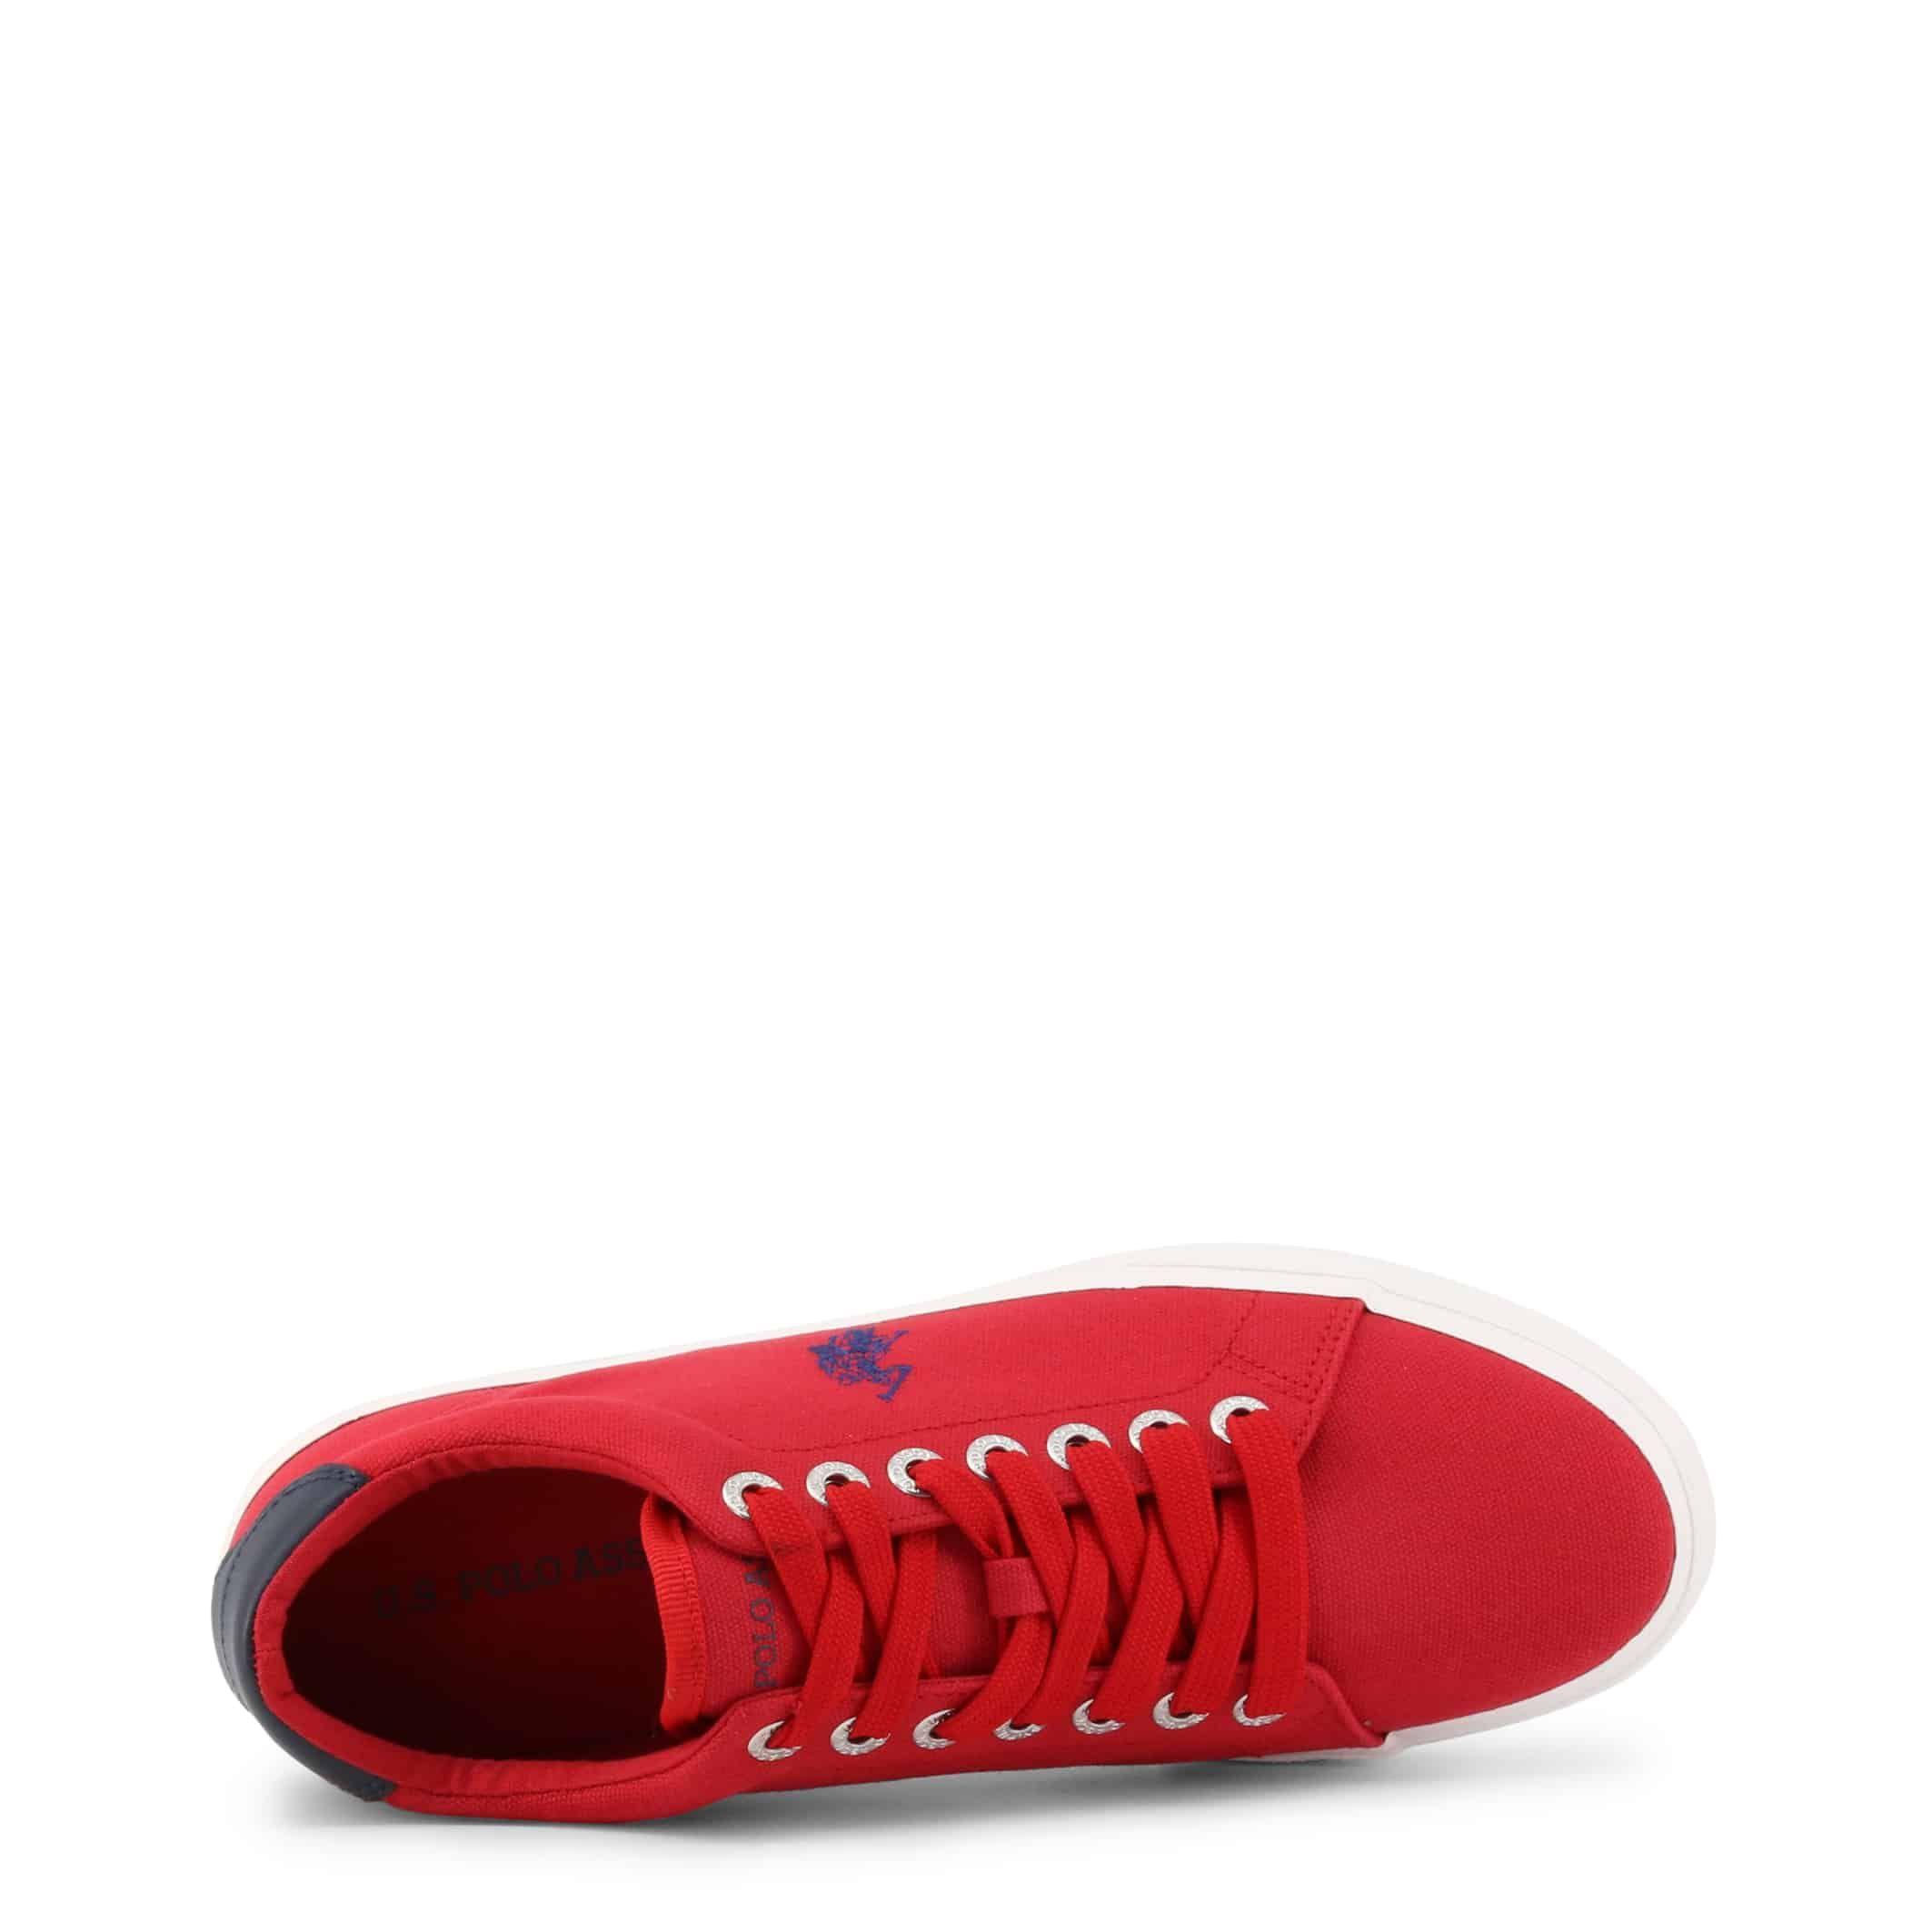 U.S. Polo Assn. - MARCS4082S0_CY1 | You Fashion Outlet